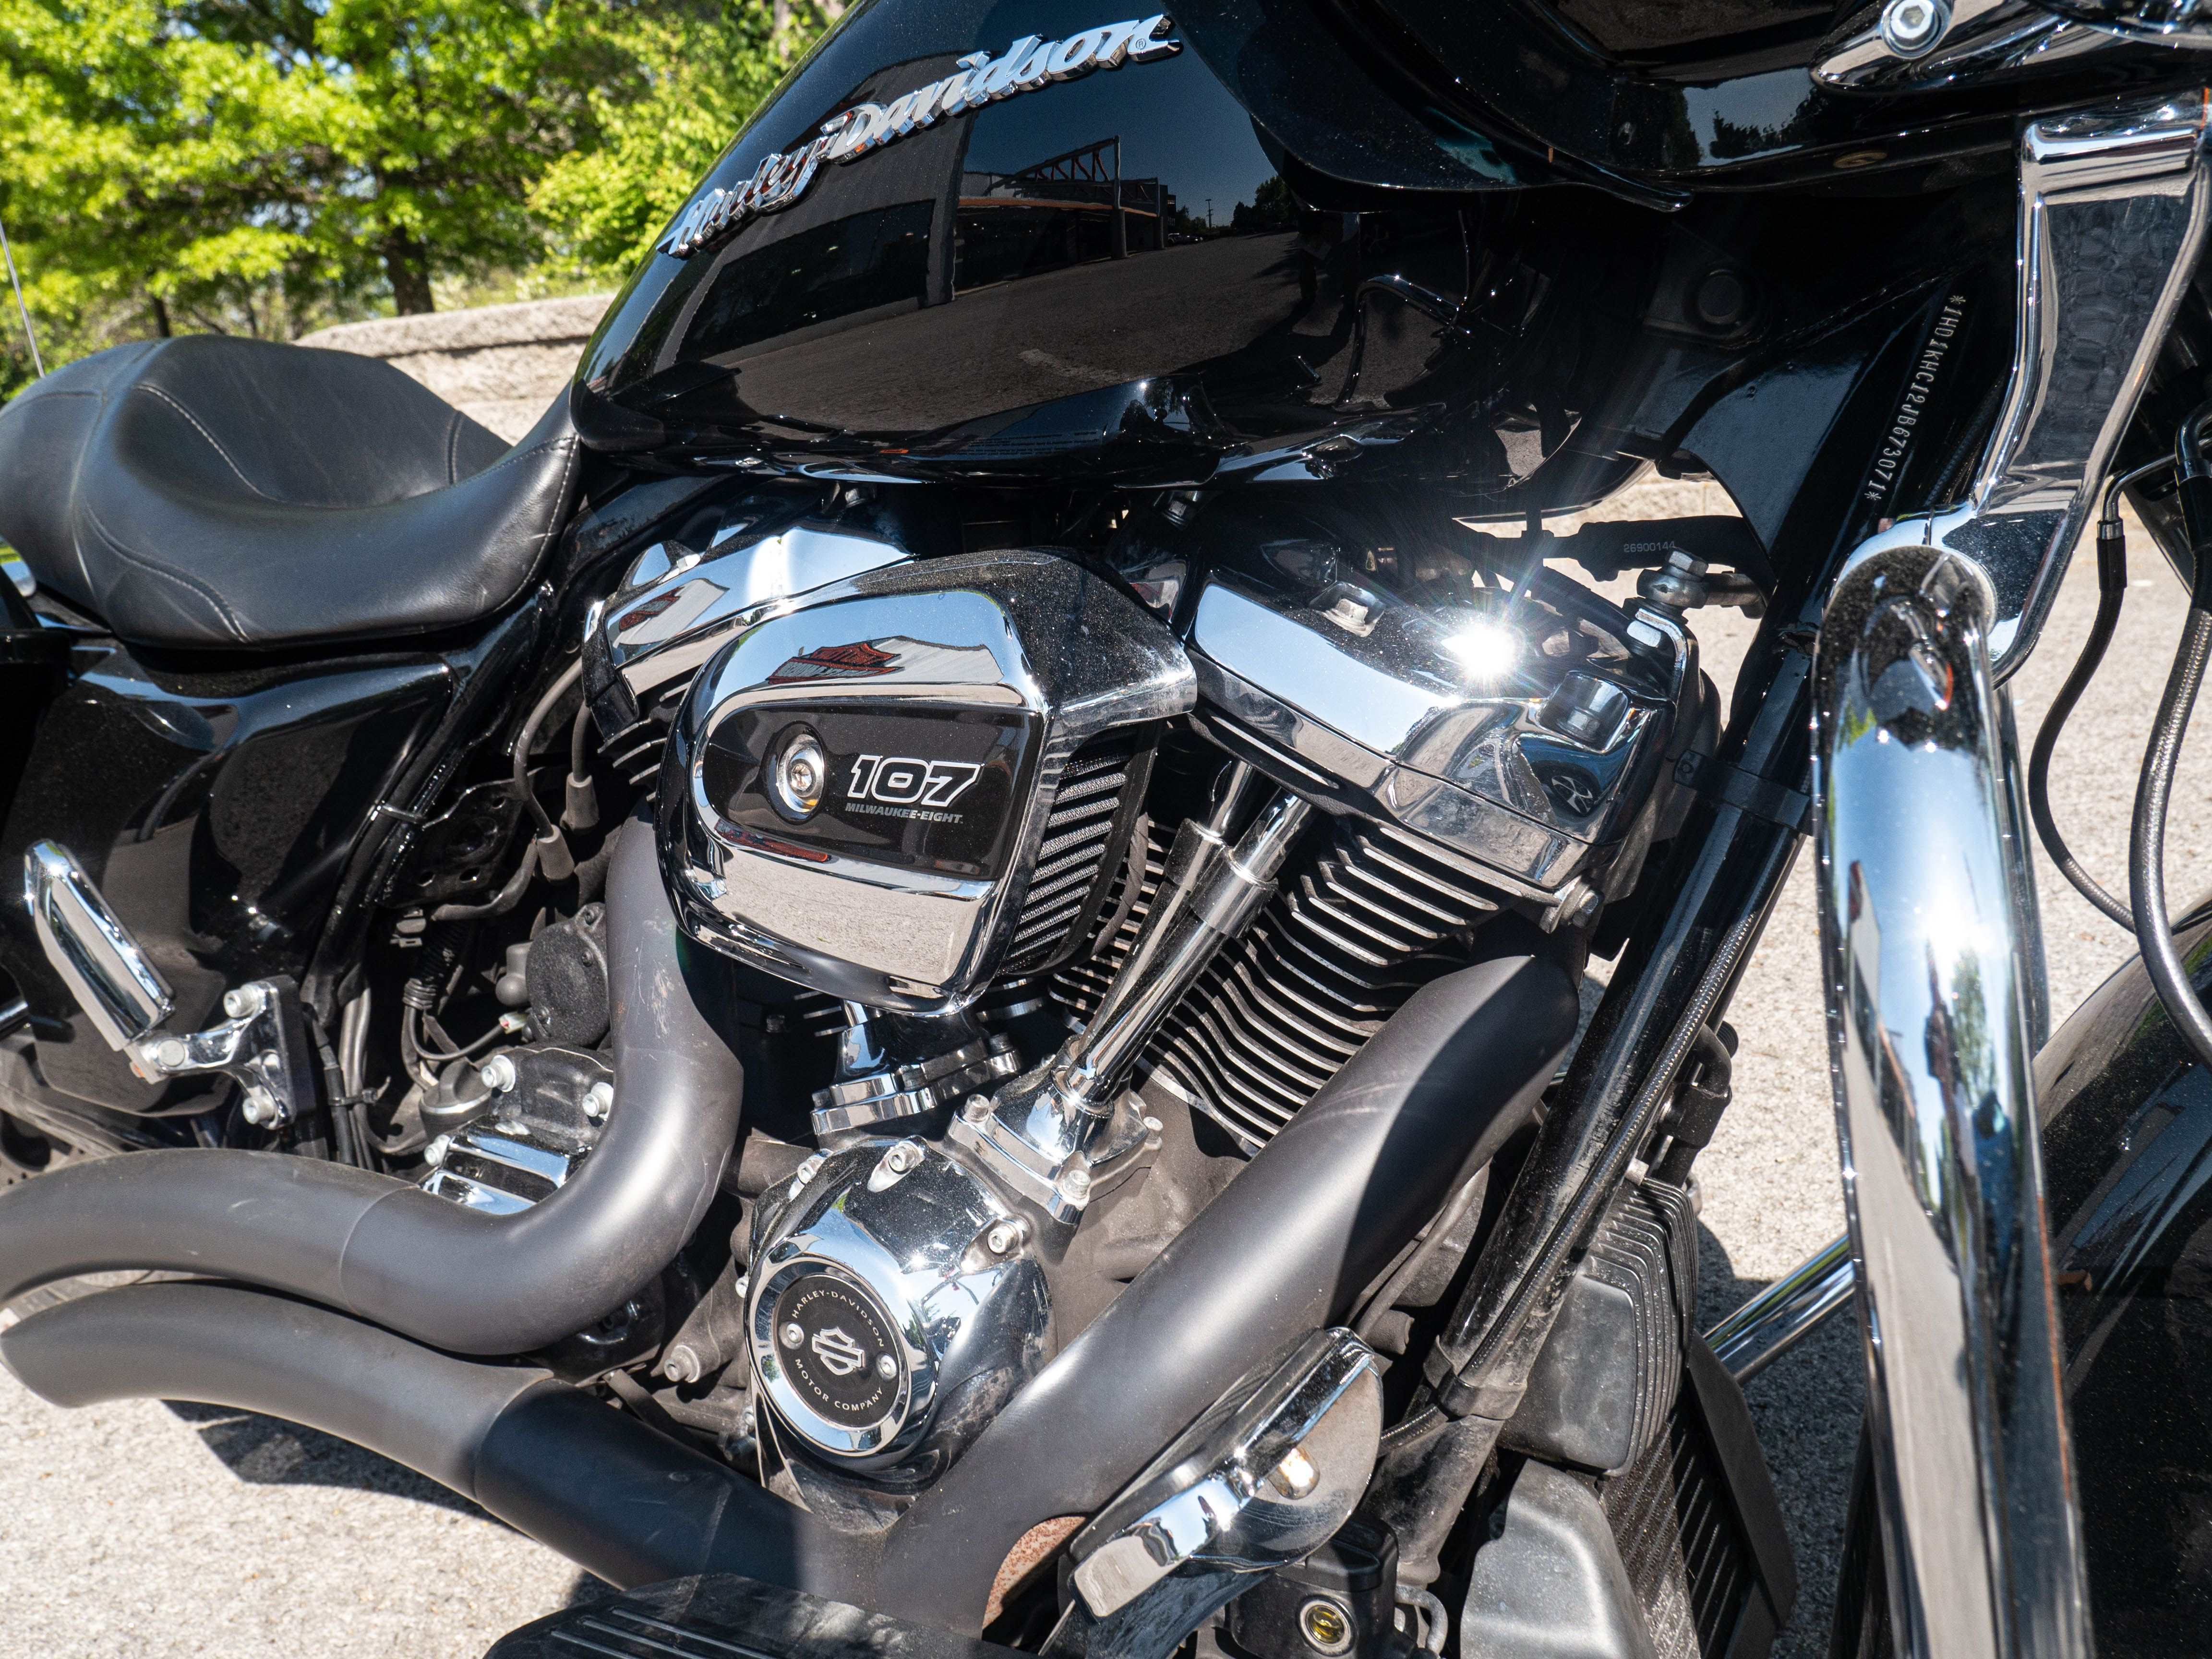 Pre-Owned 2018 Harley-Davidson Road Glide